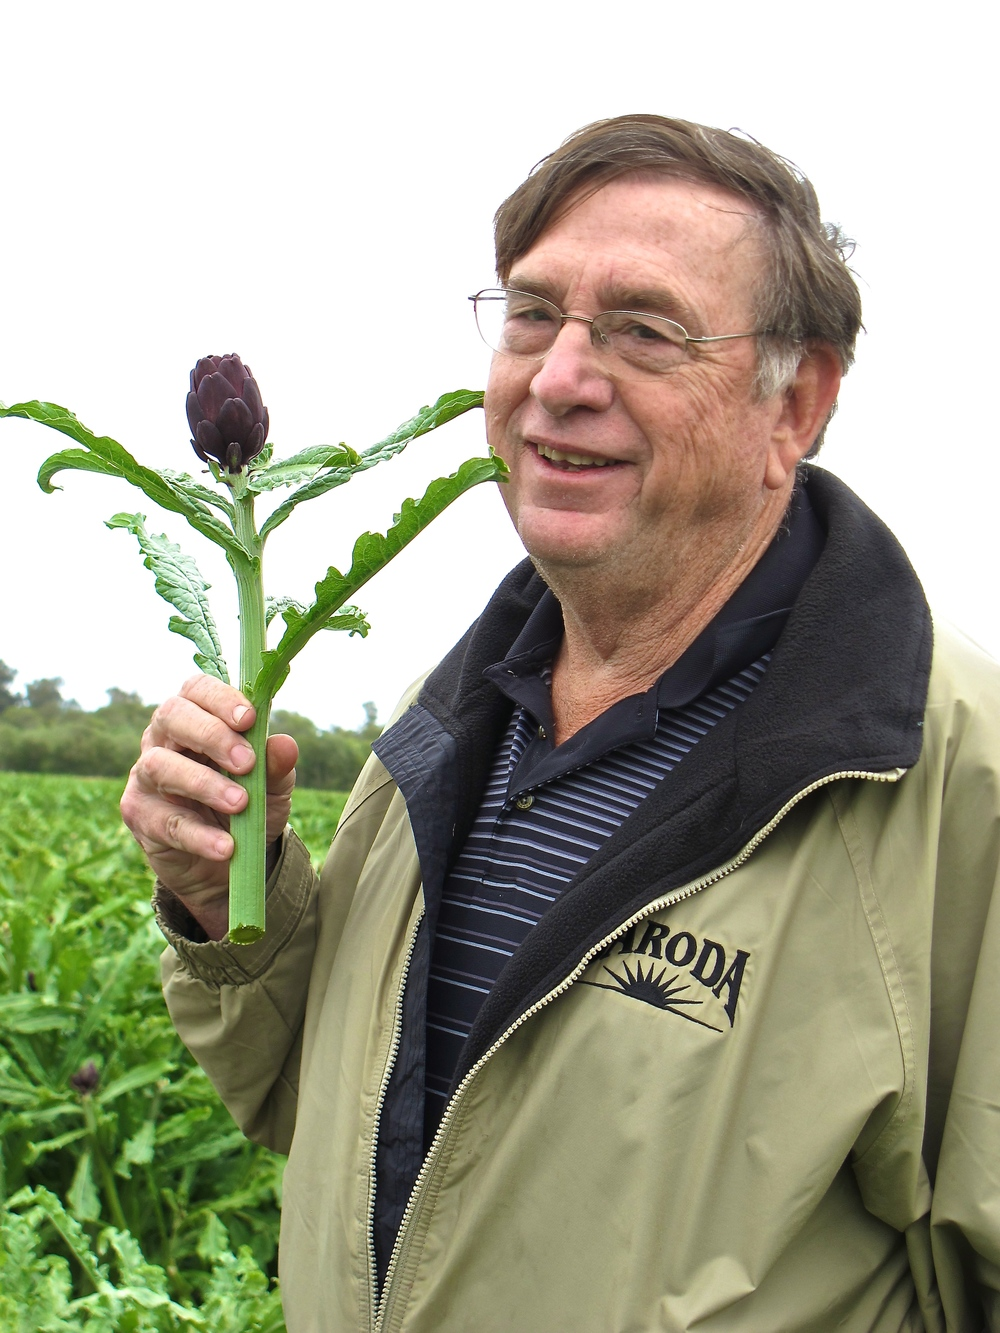 Steve Jordan, Baroda Farms